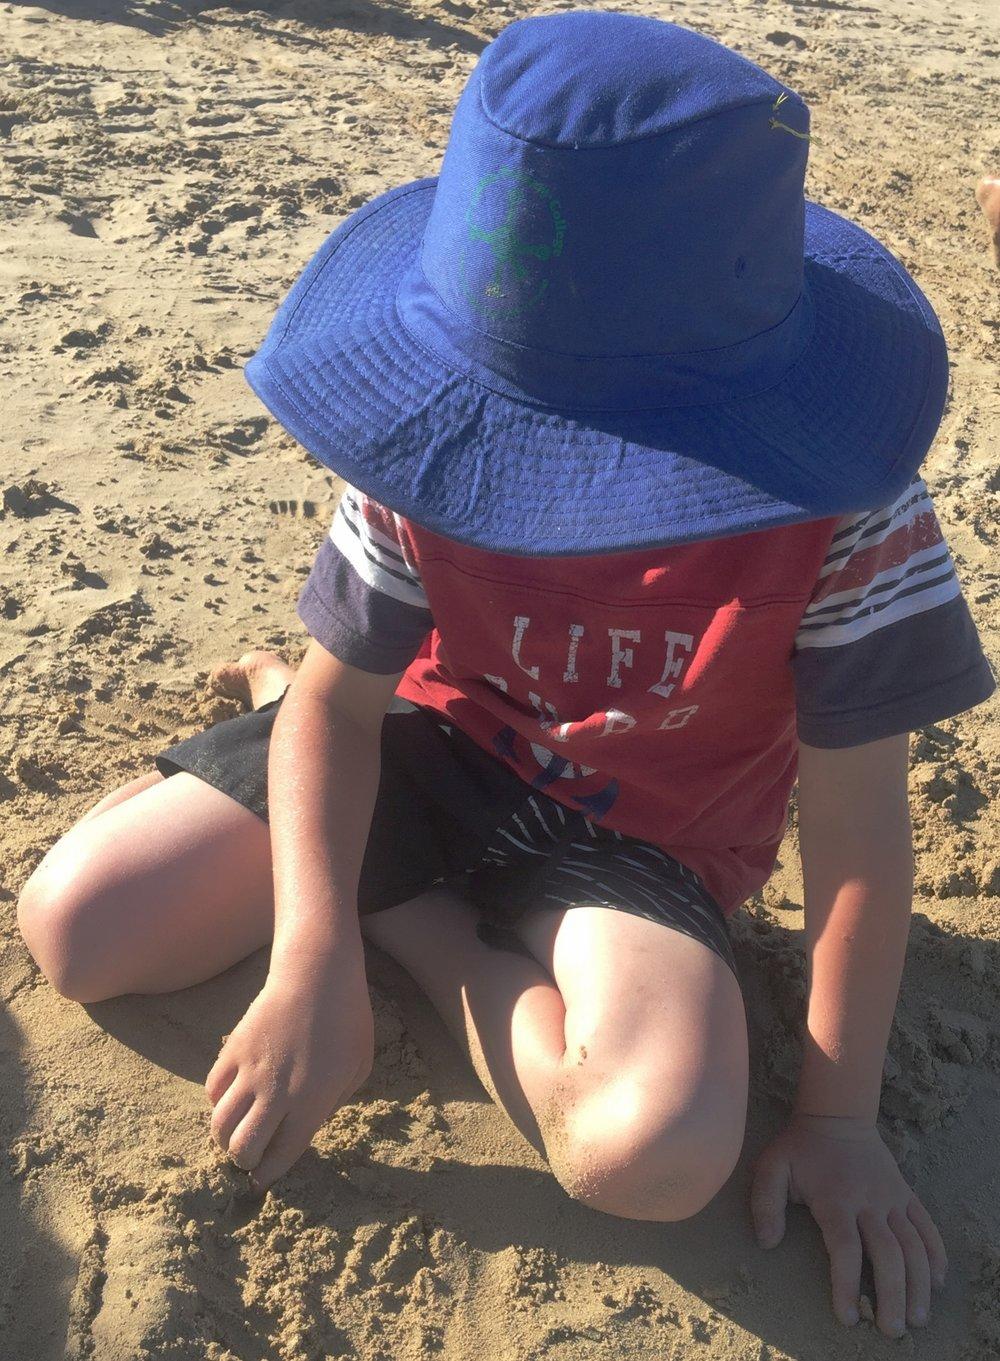 sand play boy.JPG